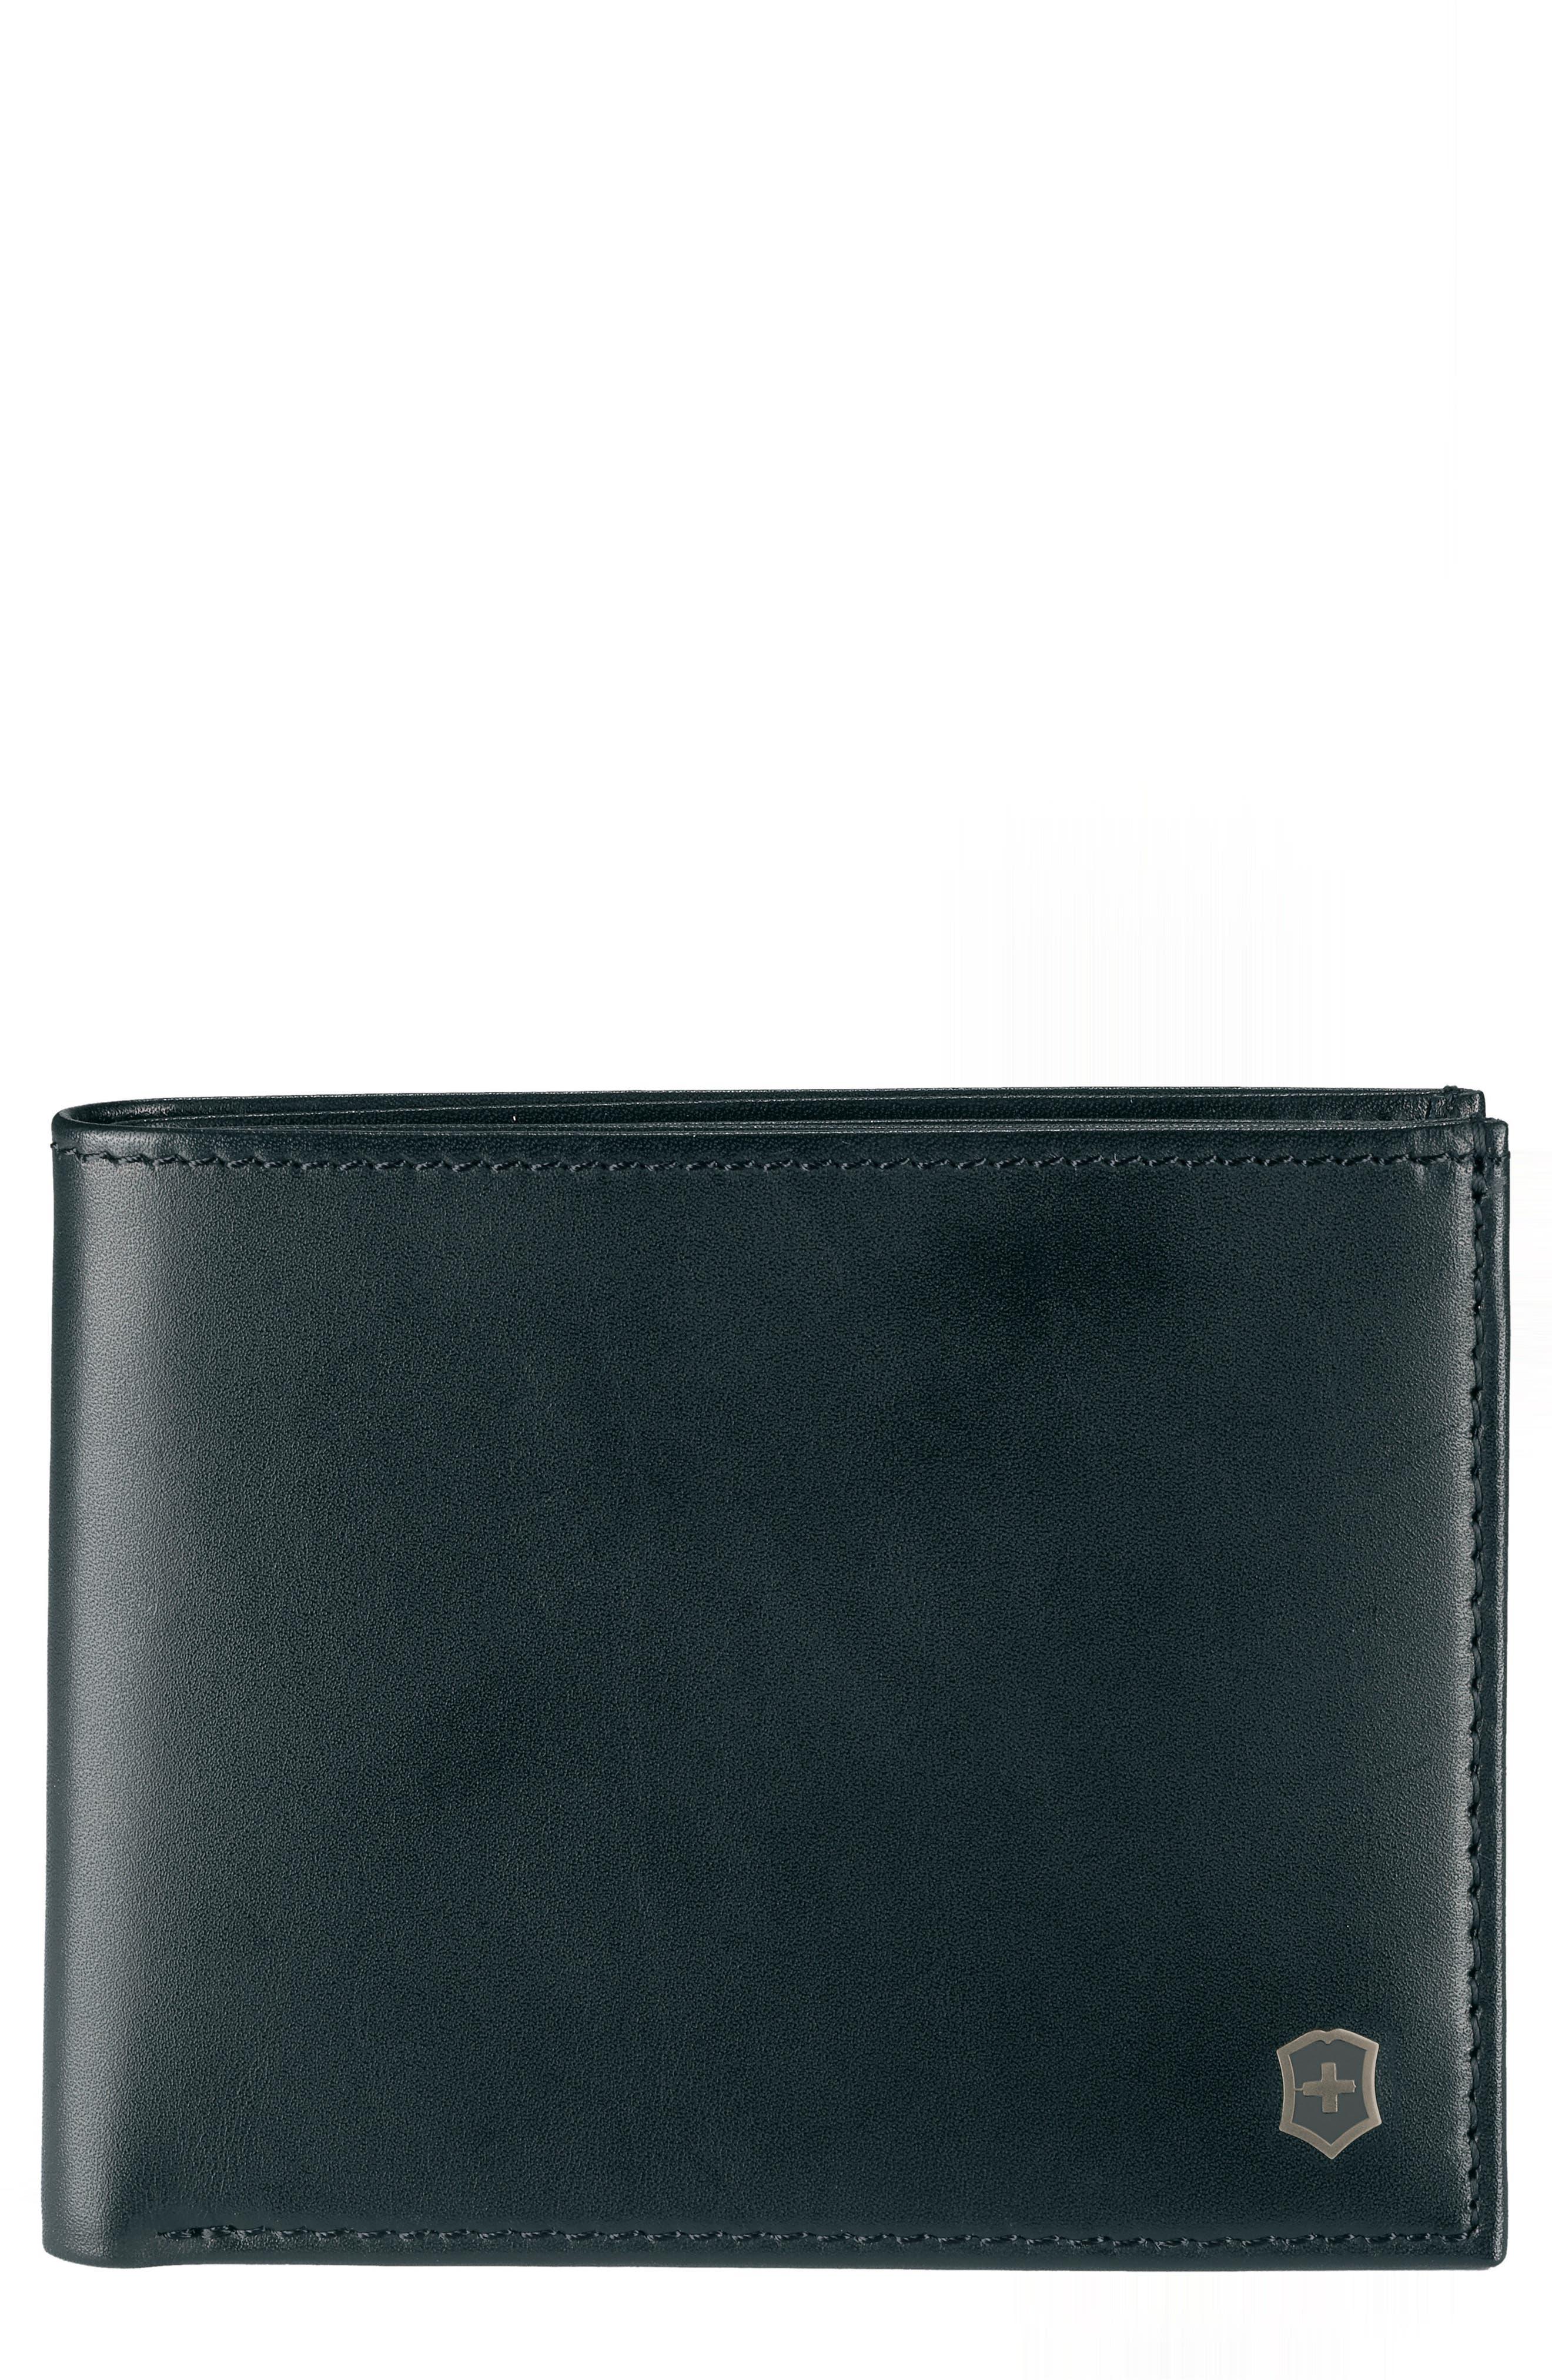 Altius Edge Appolonios RFID Leather Wallet,                         Main,                         color, BLACK